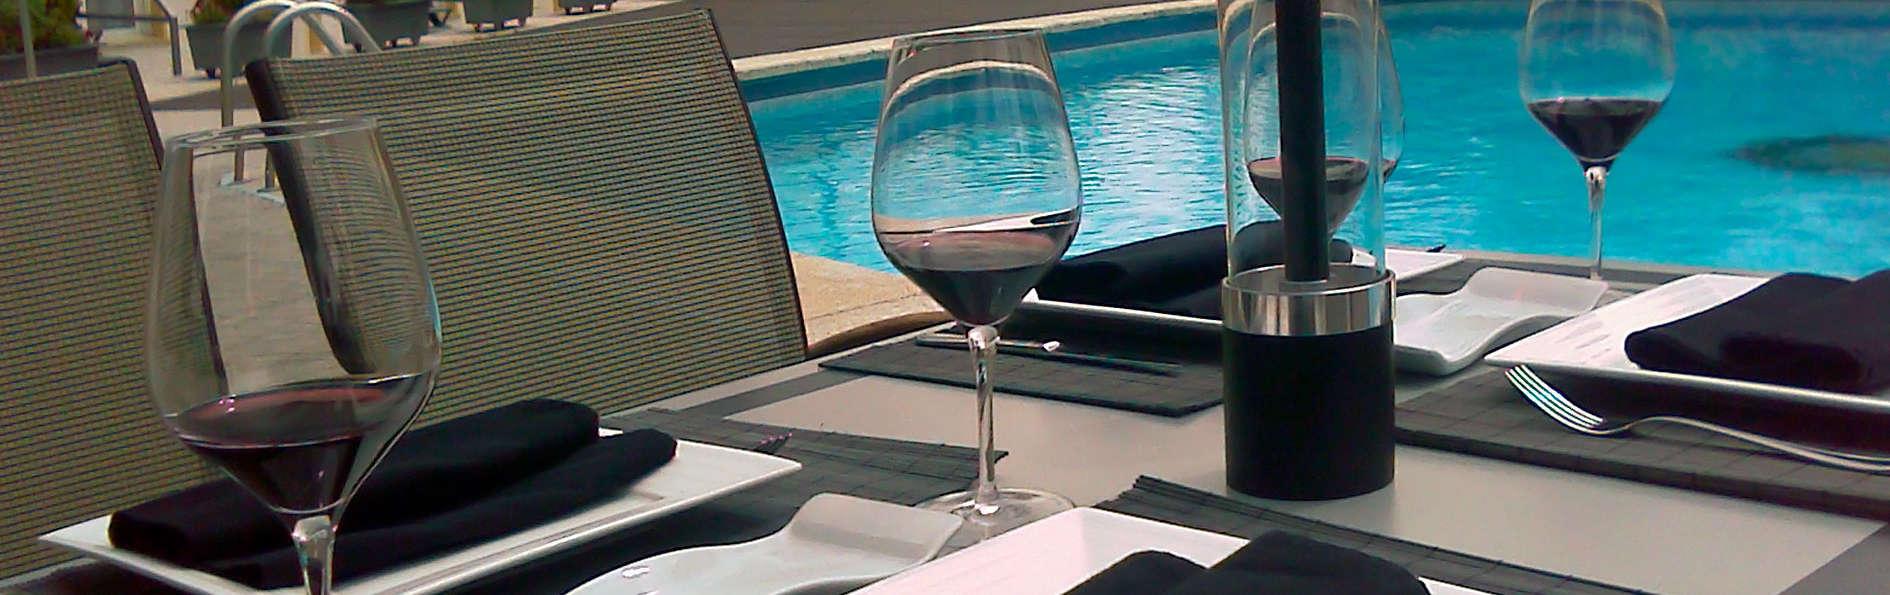 Hotel Osuna - edit_pool1.jpg